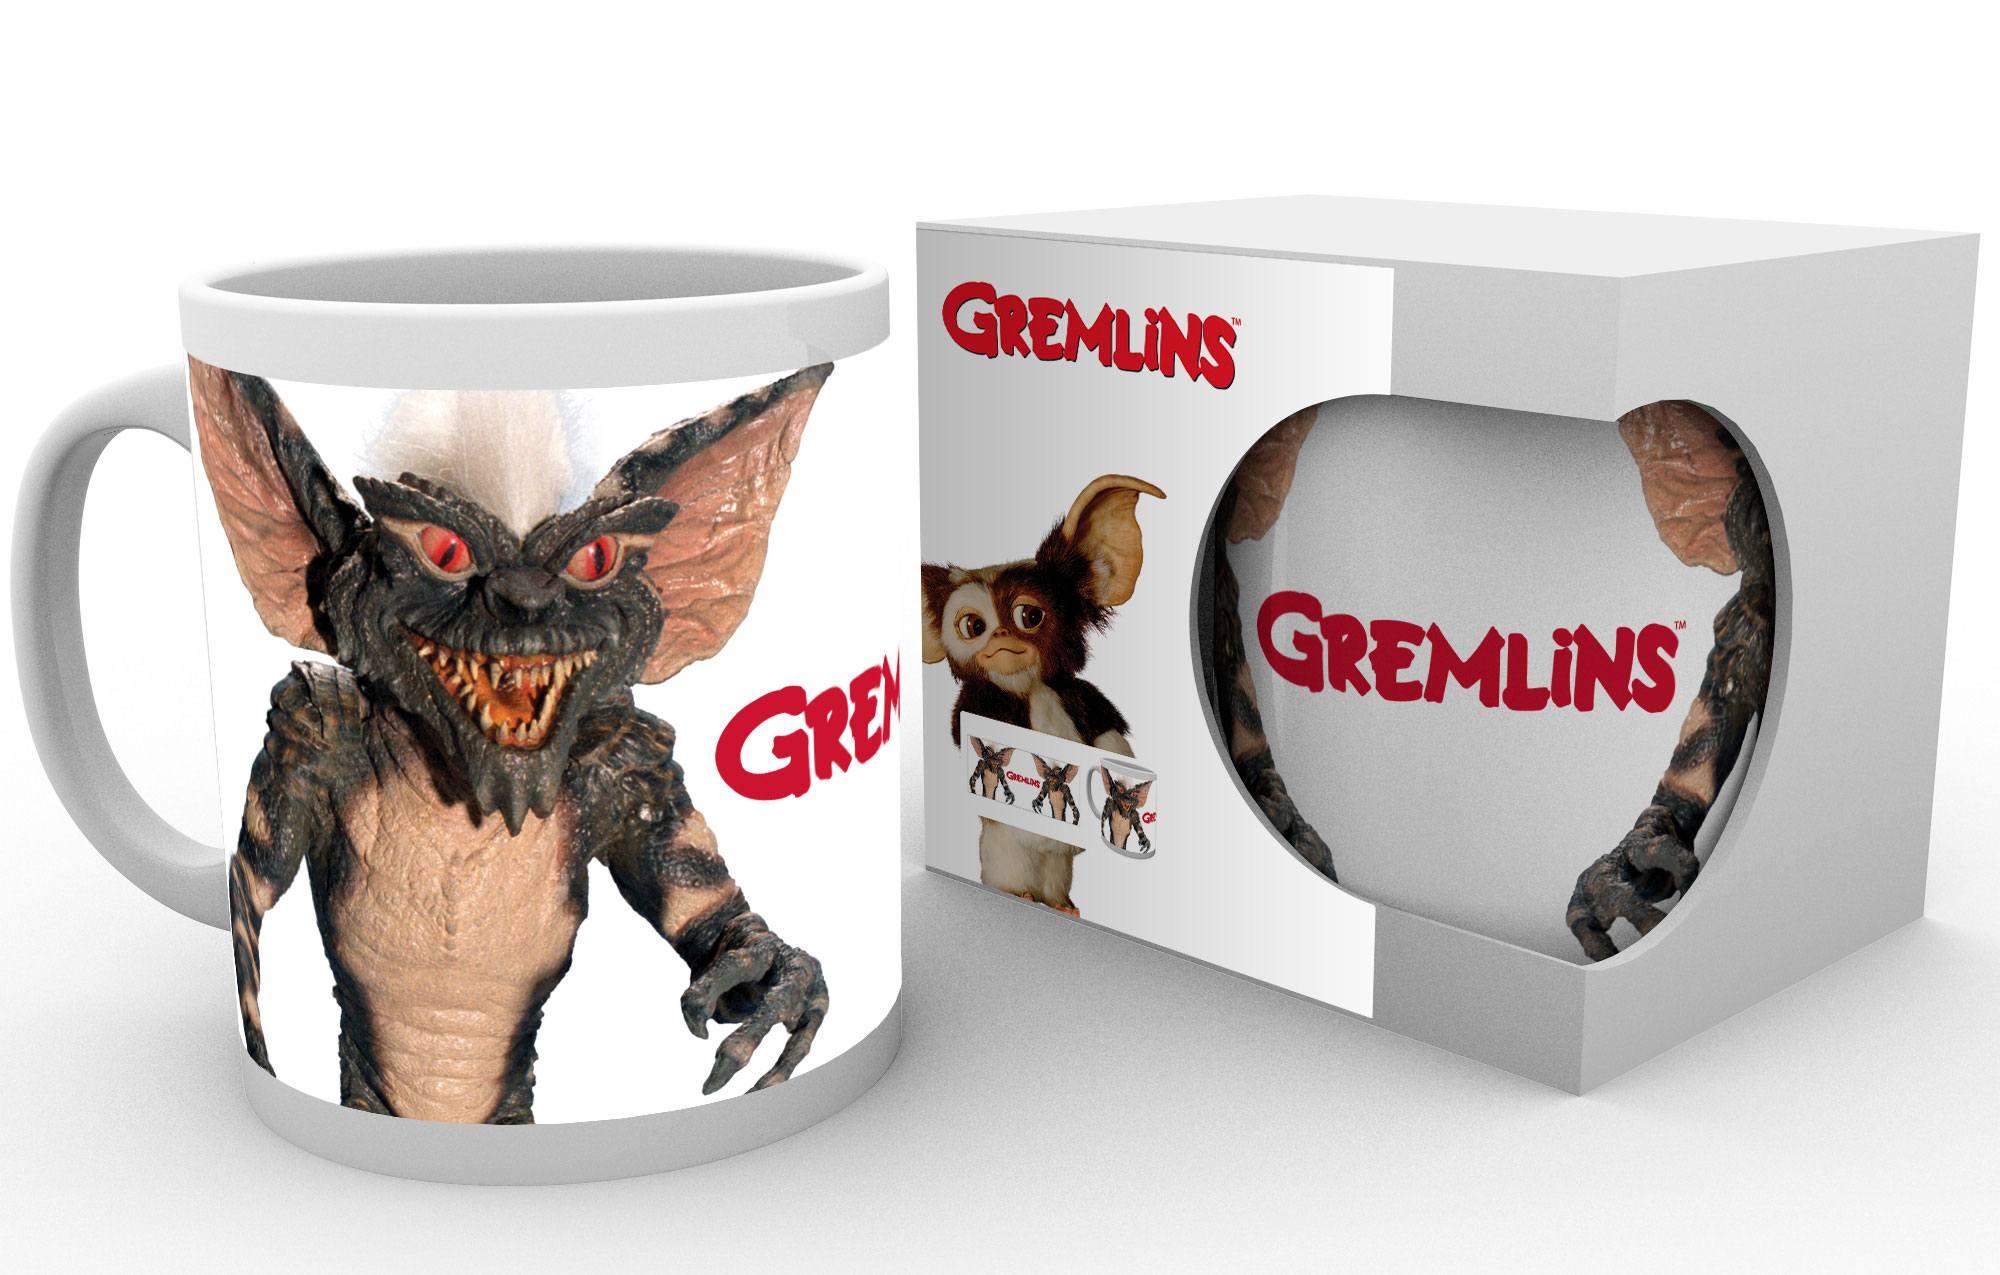 Gremlins Mug heo Exclusive